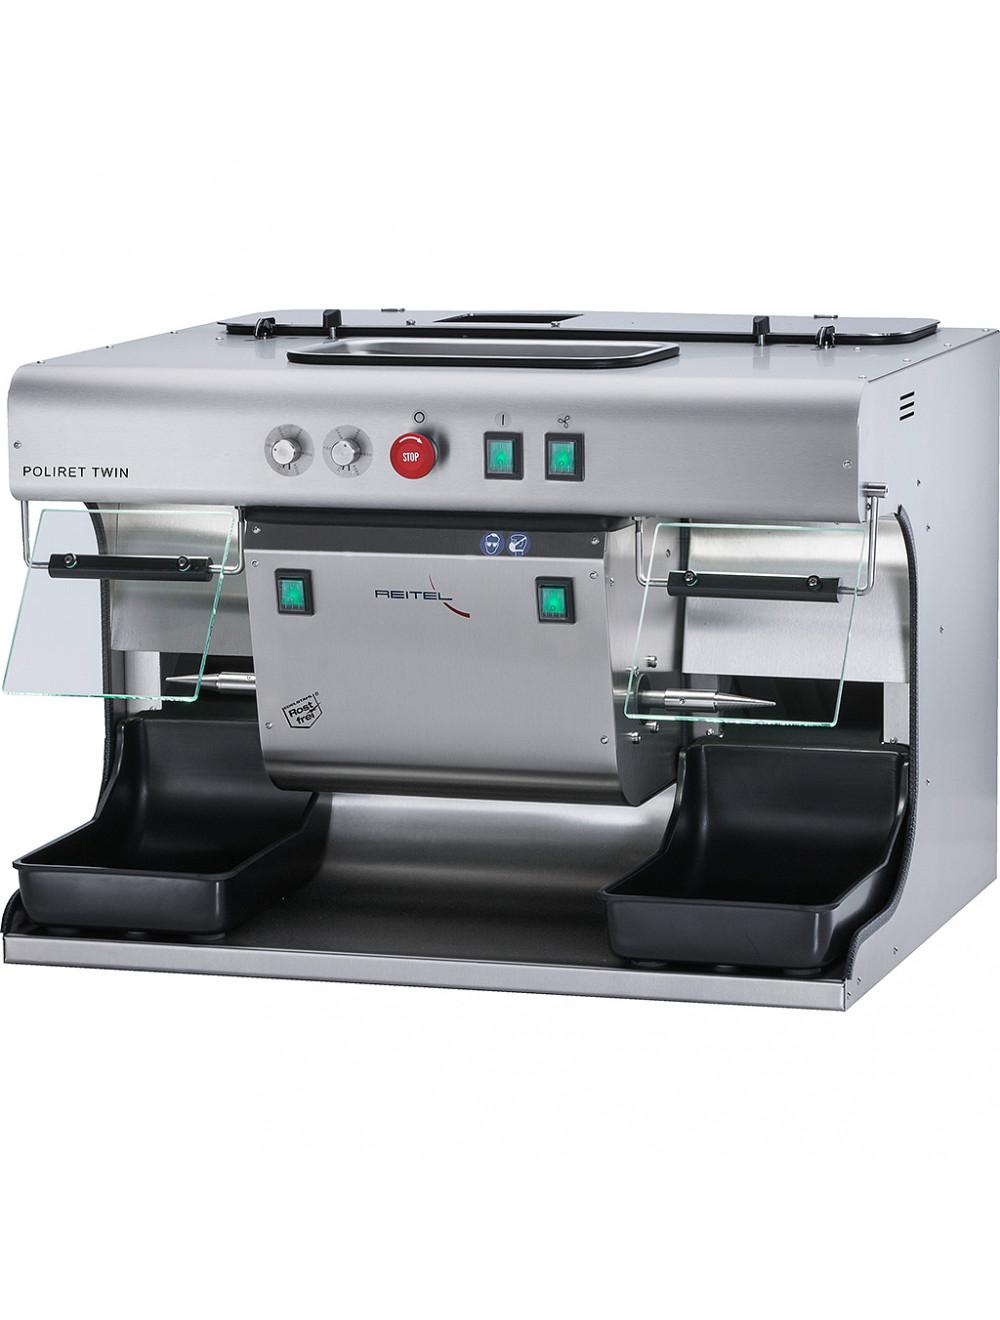 Das Produkt Reitel POLIRET TWIN Poliergerät 12703000 aus dem Global-dent online shop.